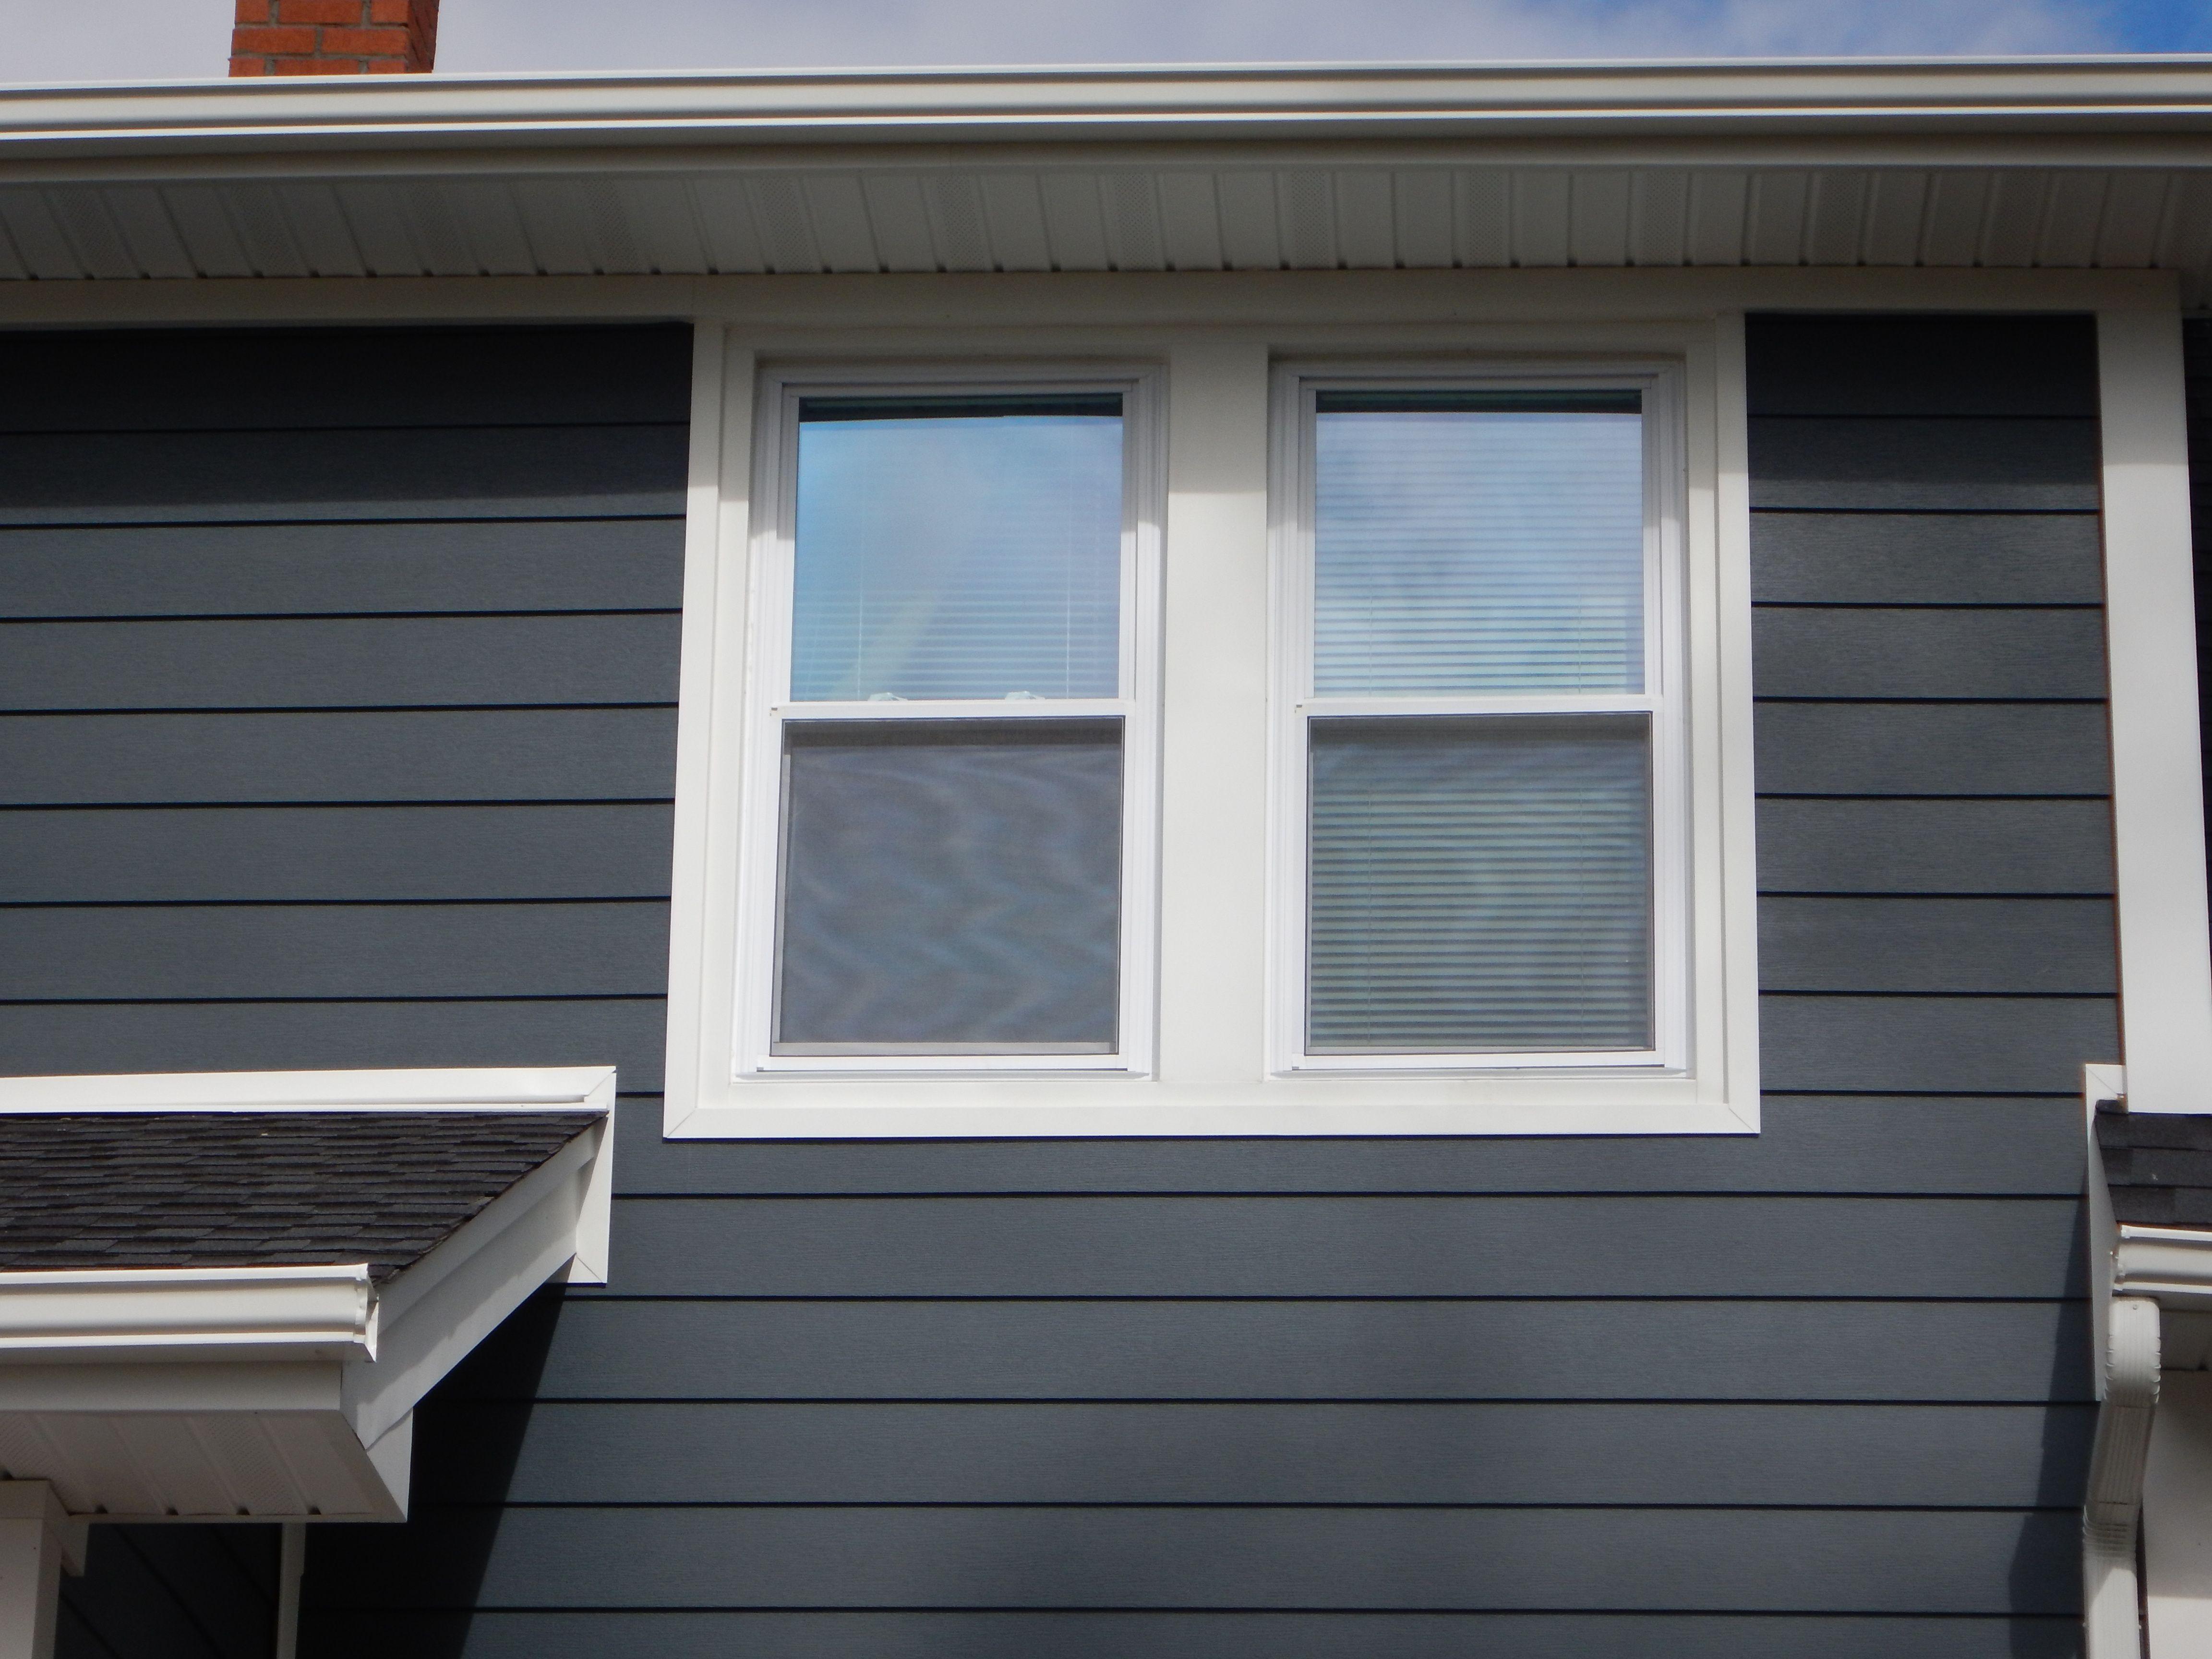 Affordable Royal Celect Siding Contractor Emerson Nj Vinyl Siding Companies Englewood Nj Fiber Cement Siding Installation Englewood Cliffs Nj Hardie Plank Si